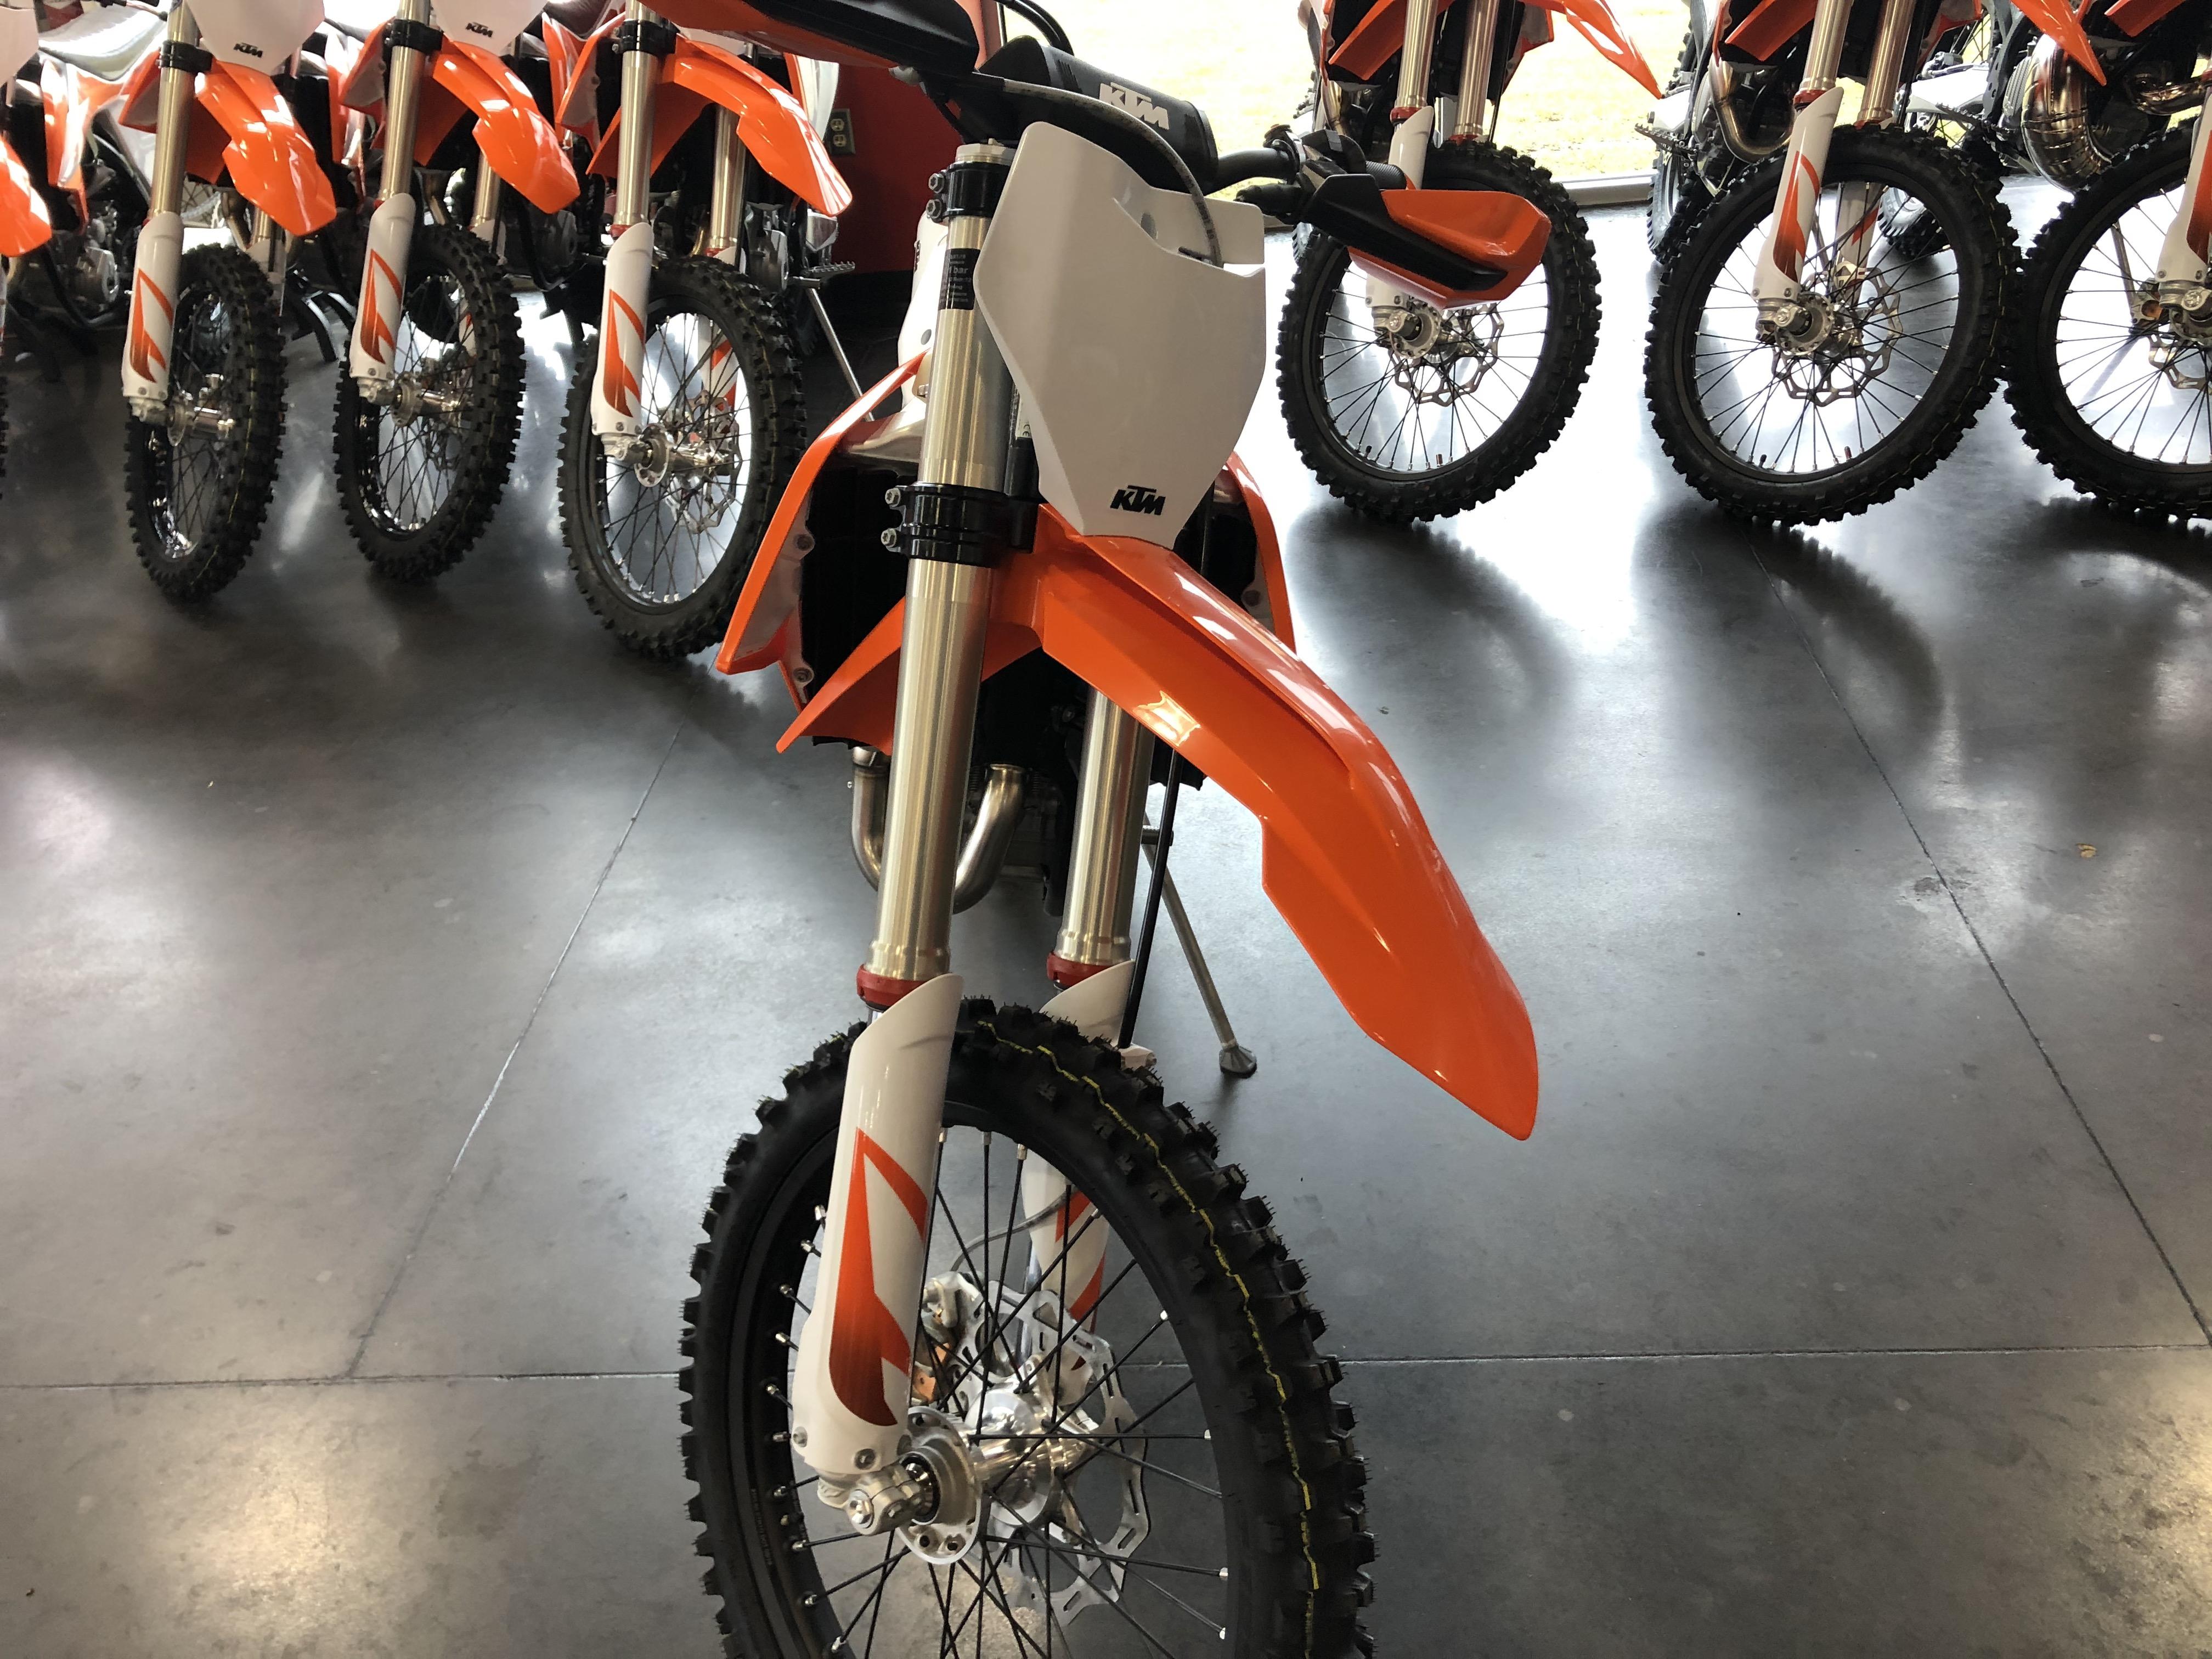 2020 KTM 450 XC-F